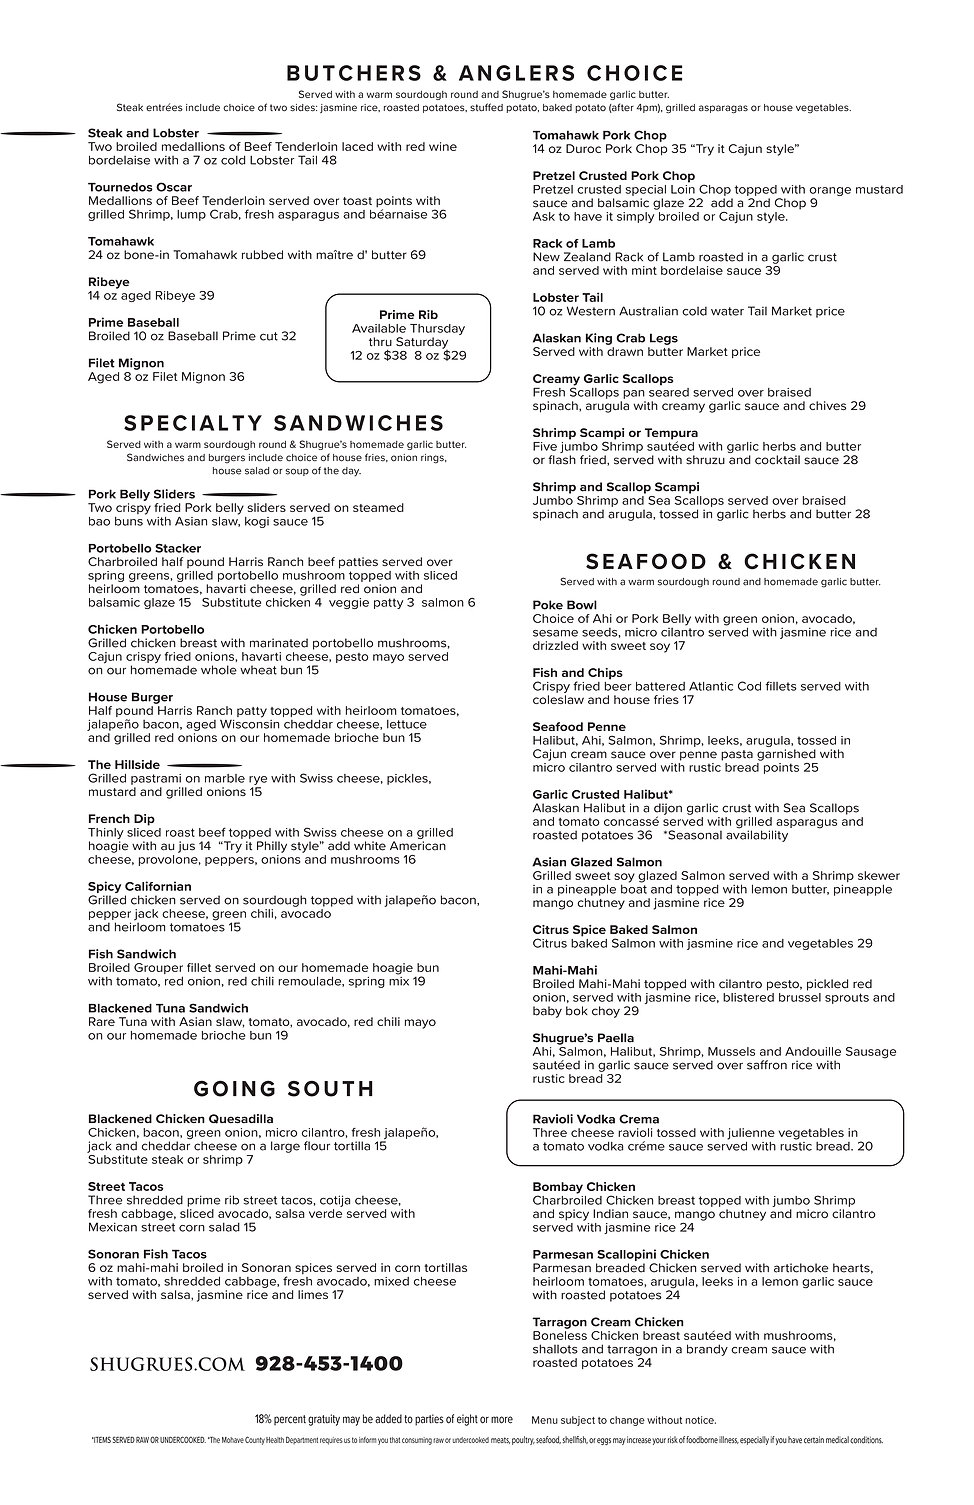 FSHUGRUES 11x17 DINNER MENU 0521 Final-2